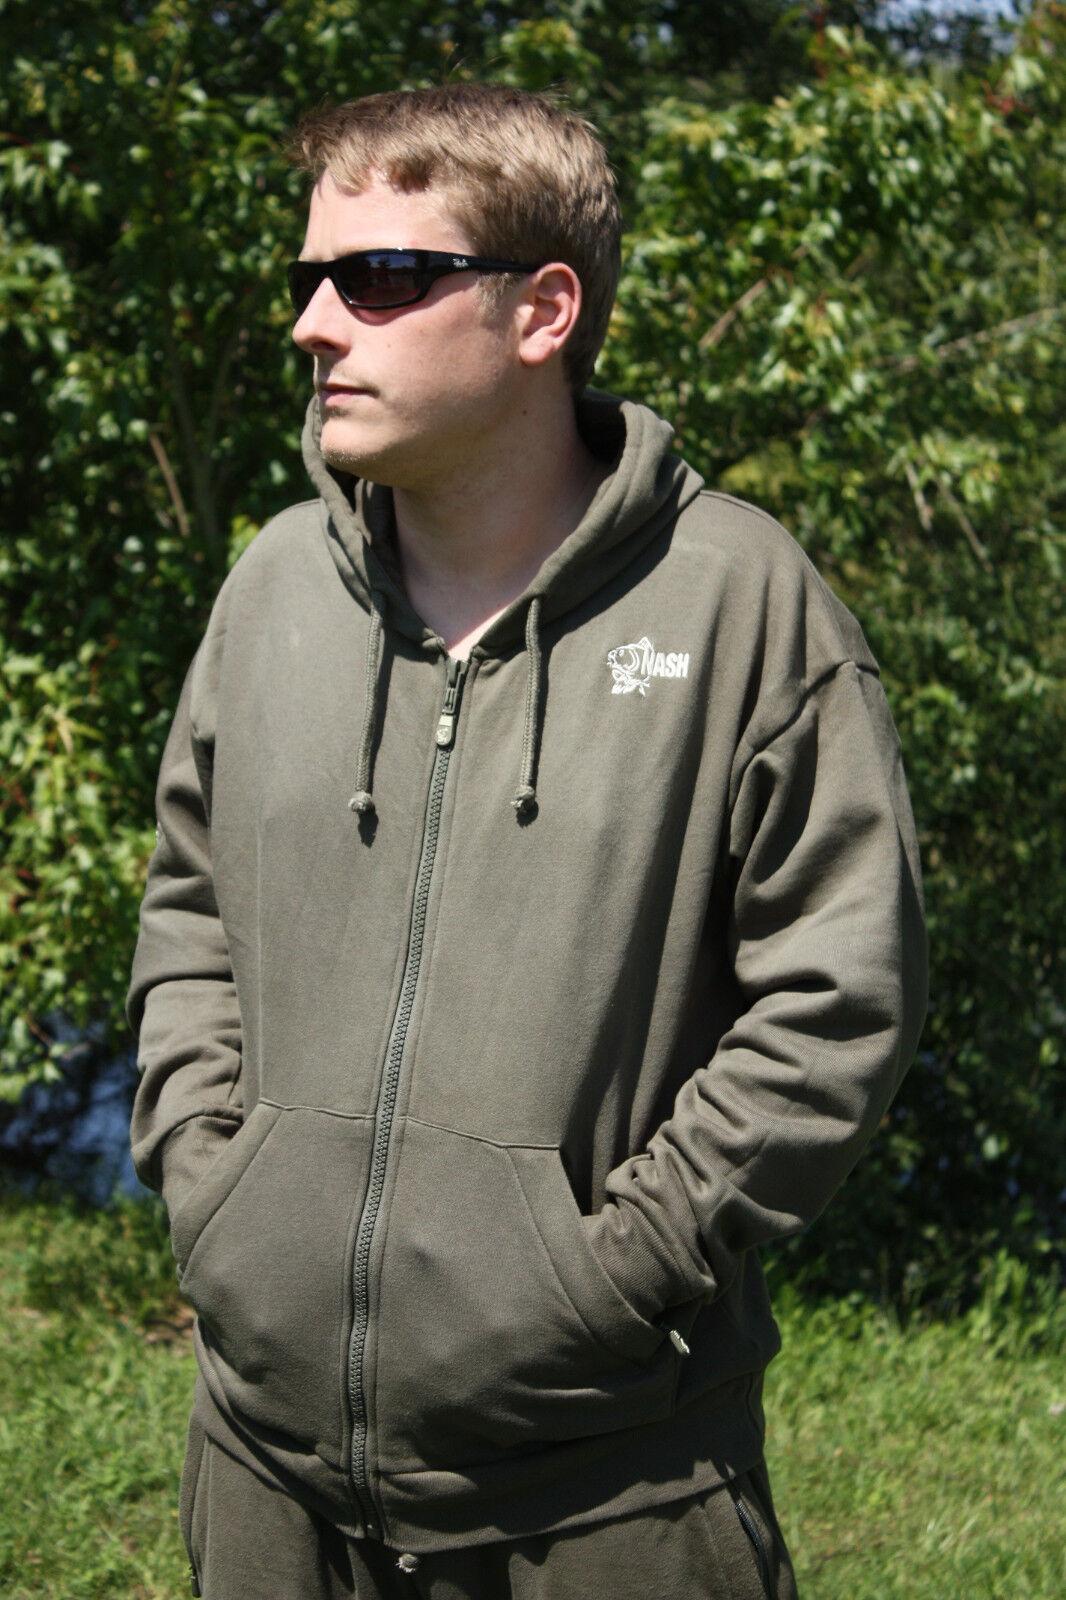 Nash Tracksuit Jacket Jacke Angeljacke Freizeitjacke Anglerjacke